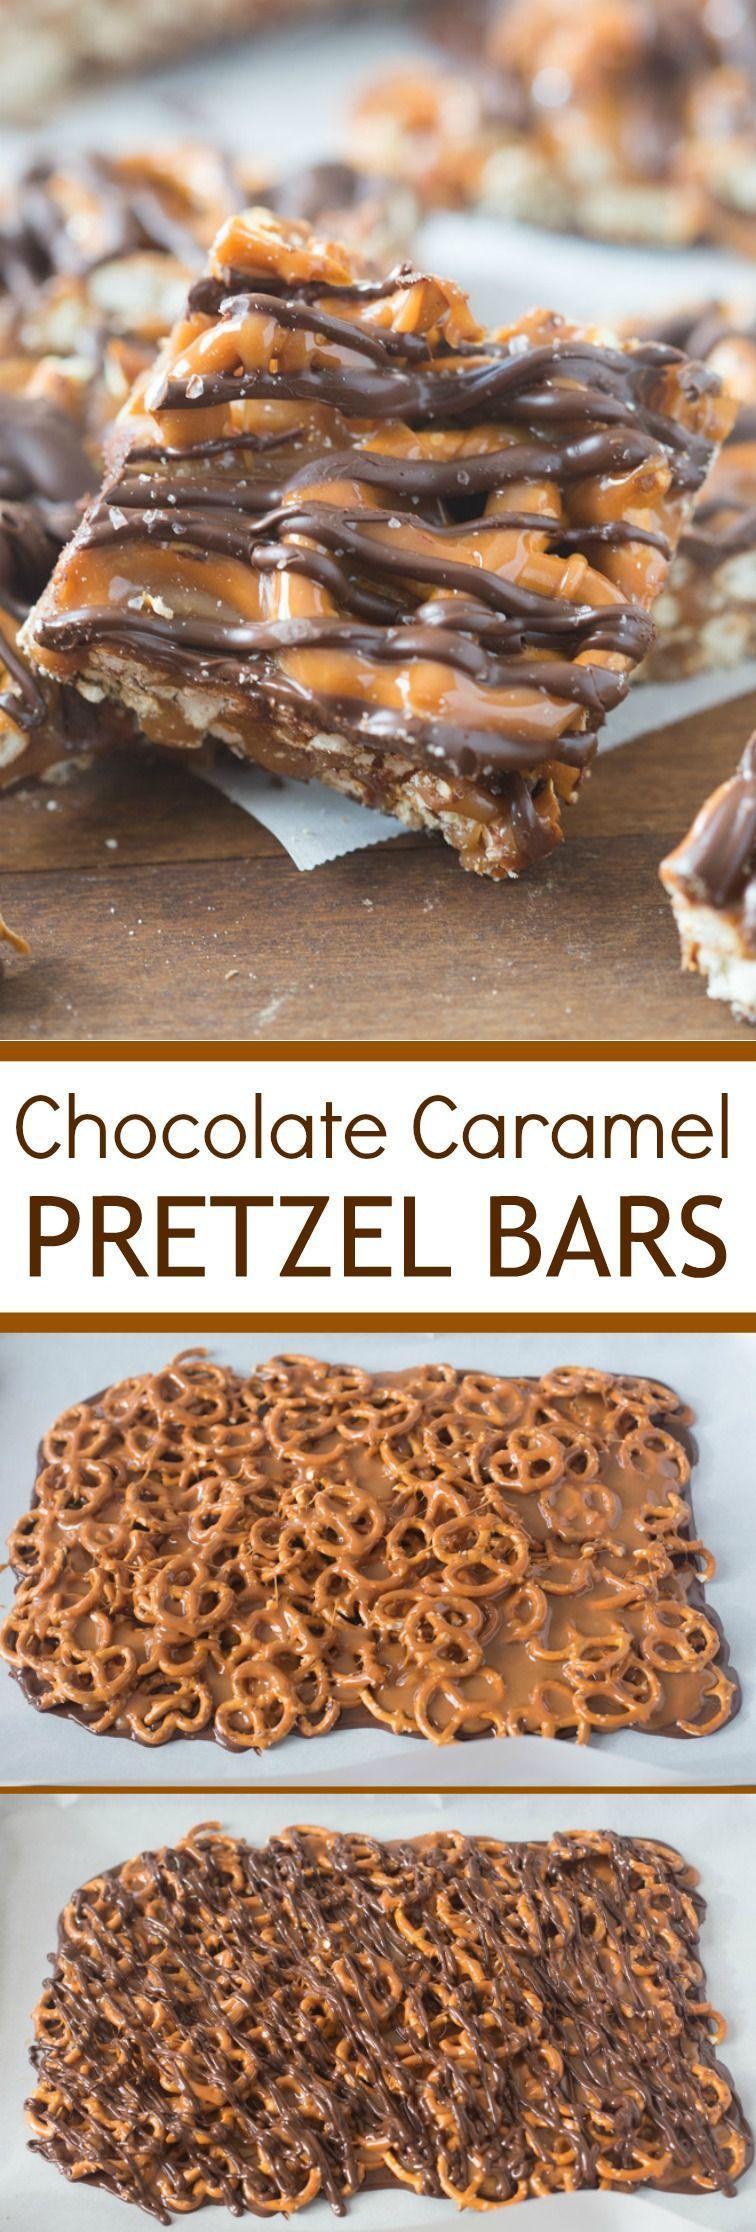 Salted Chocolate and Caramel Pretzel Bars - These simple, 4-ingredient Salted Chocolate Caramel Pr